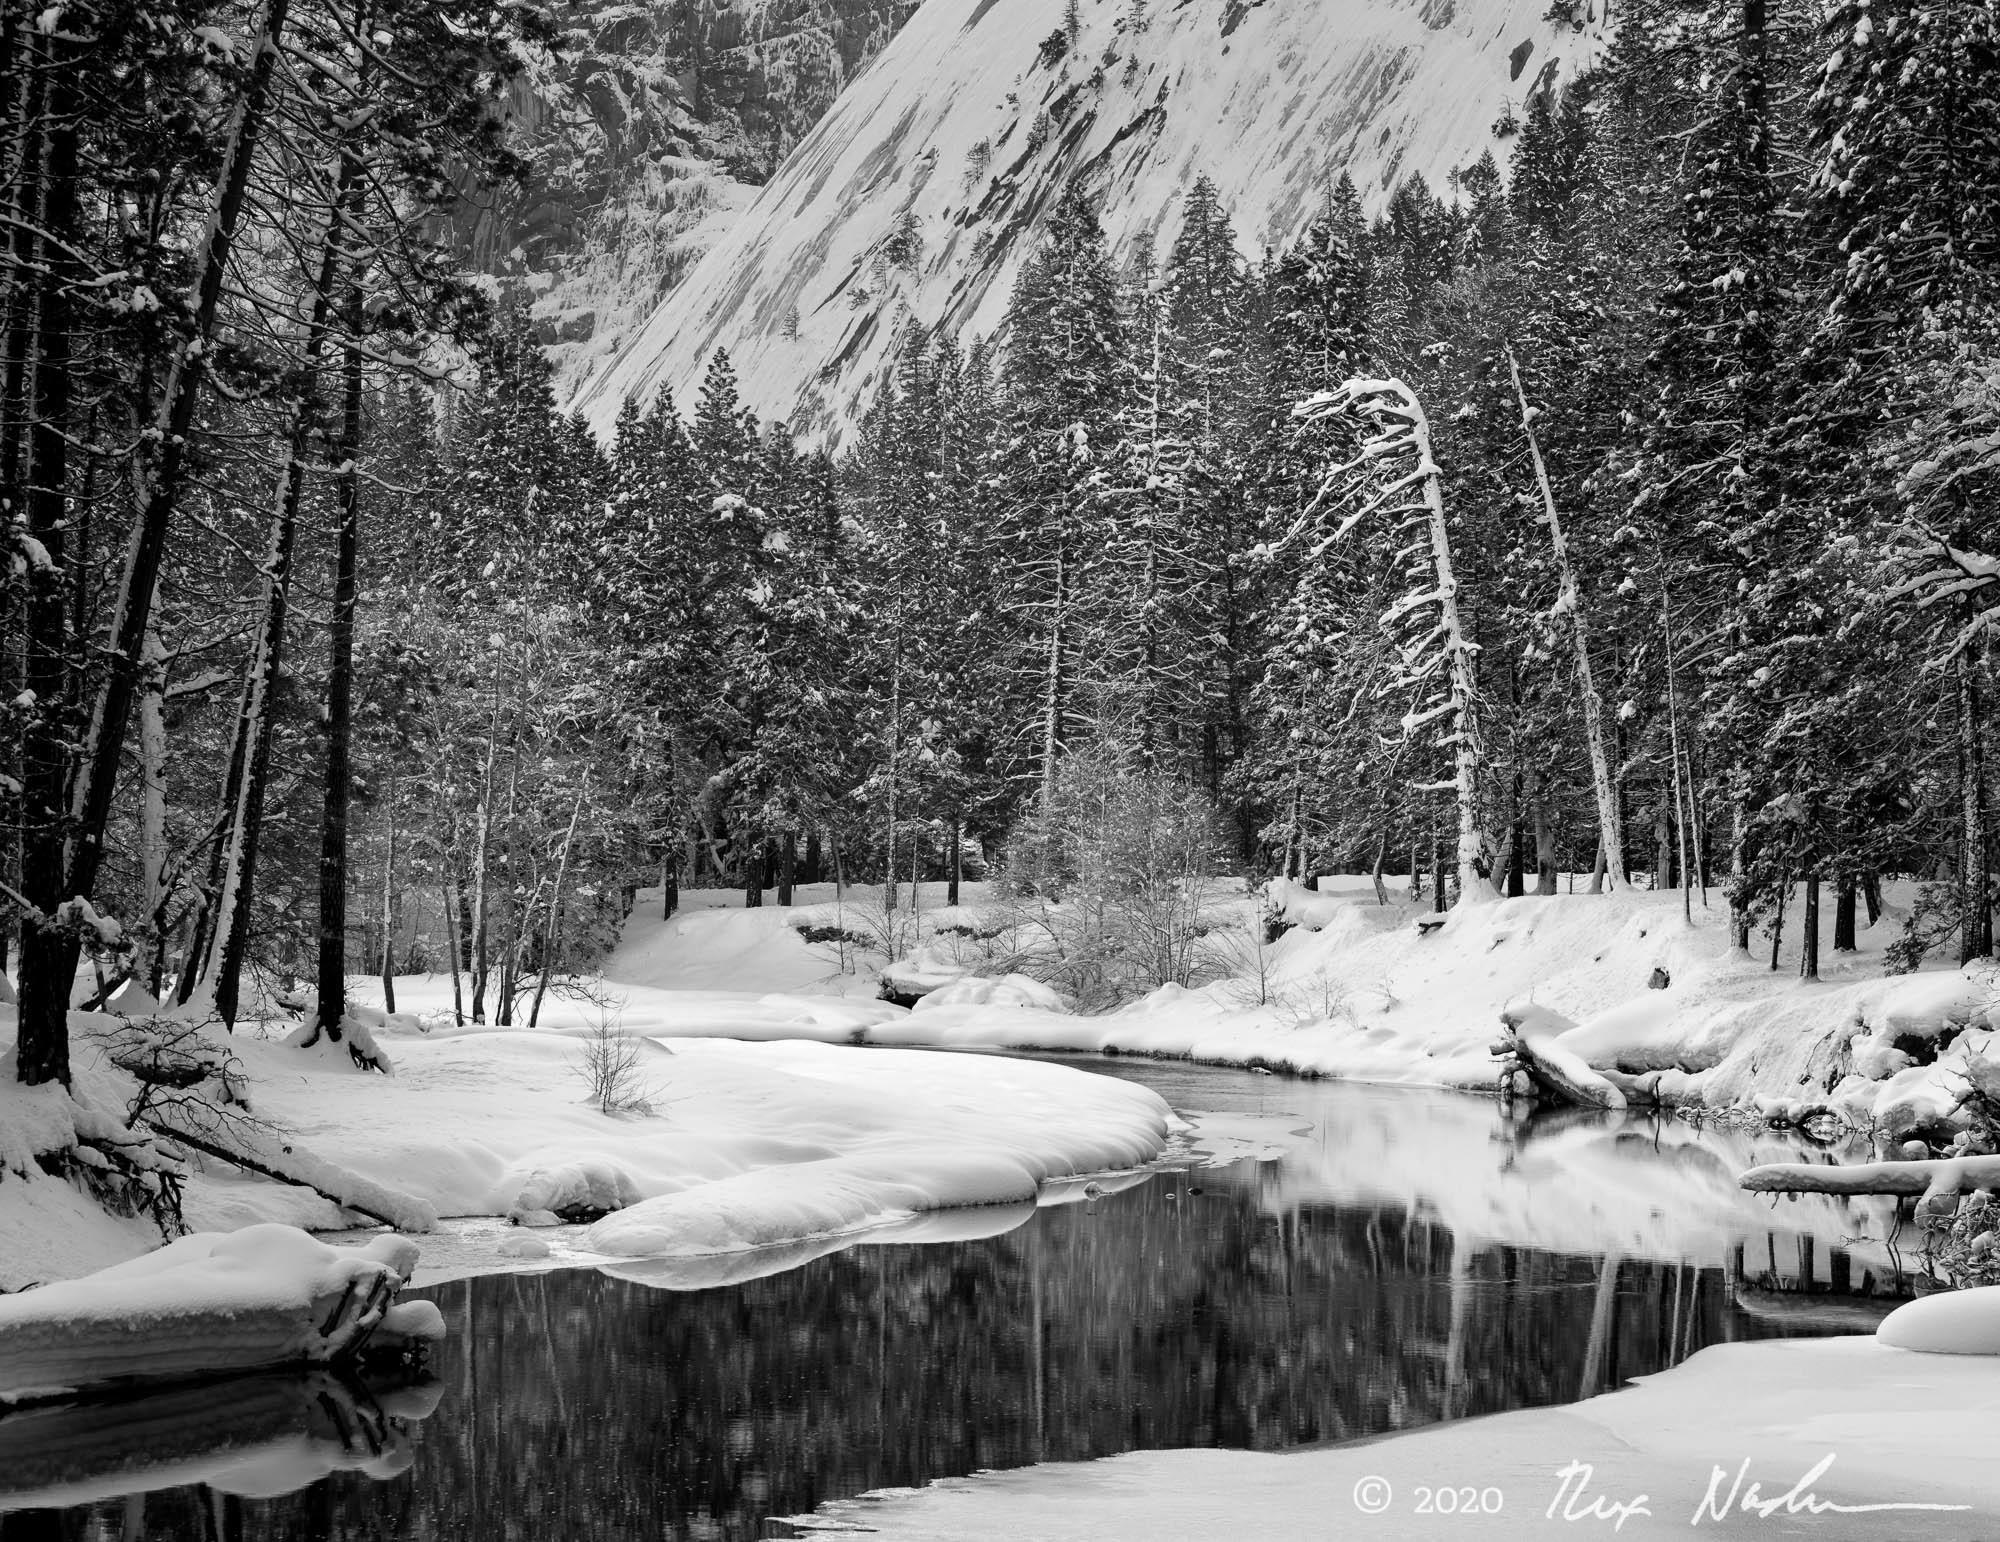 Bend - Merced River, Yosemite